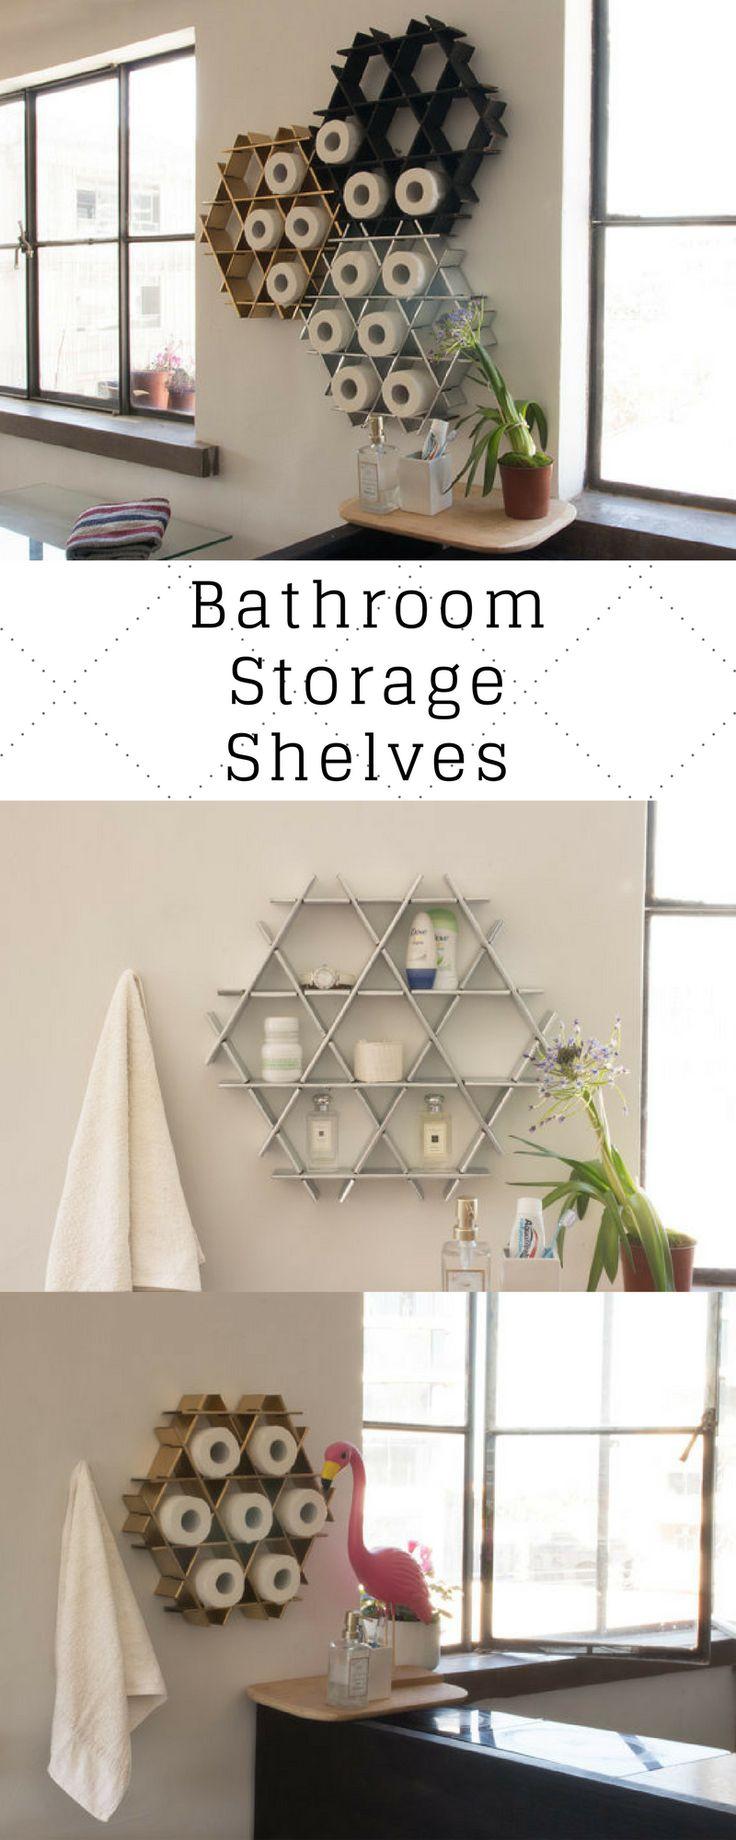 Photo Album For Website Bathroom Storage Bathroom Shelf Bathroom Organizer Modern Shelves Toilet Paper Storage